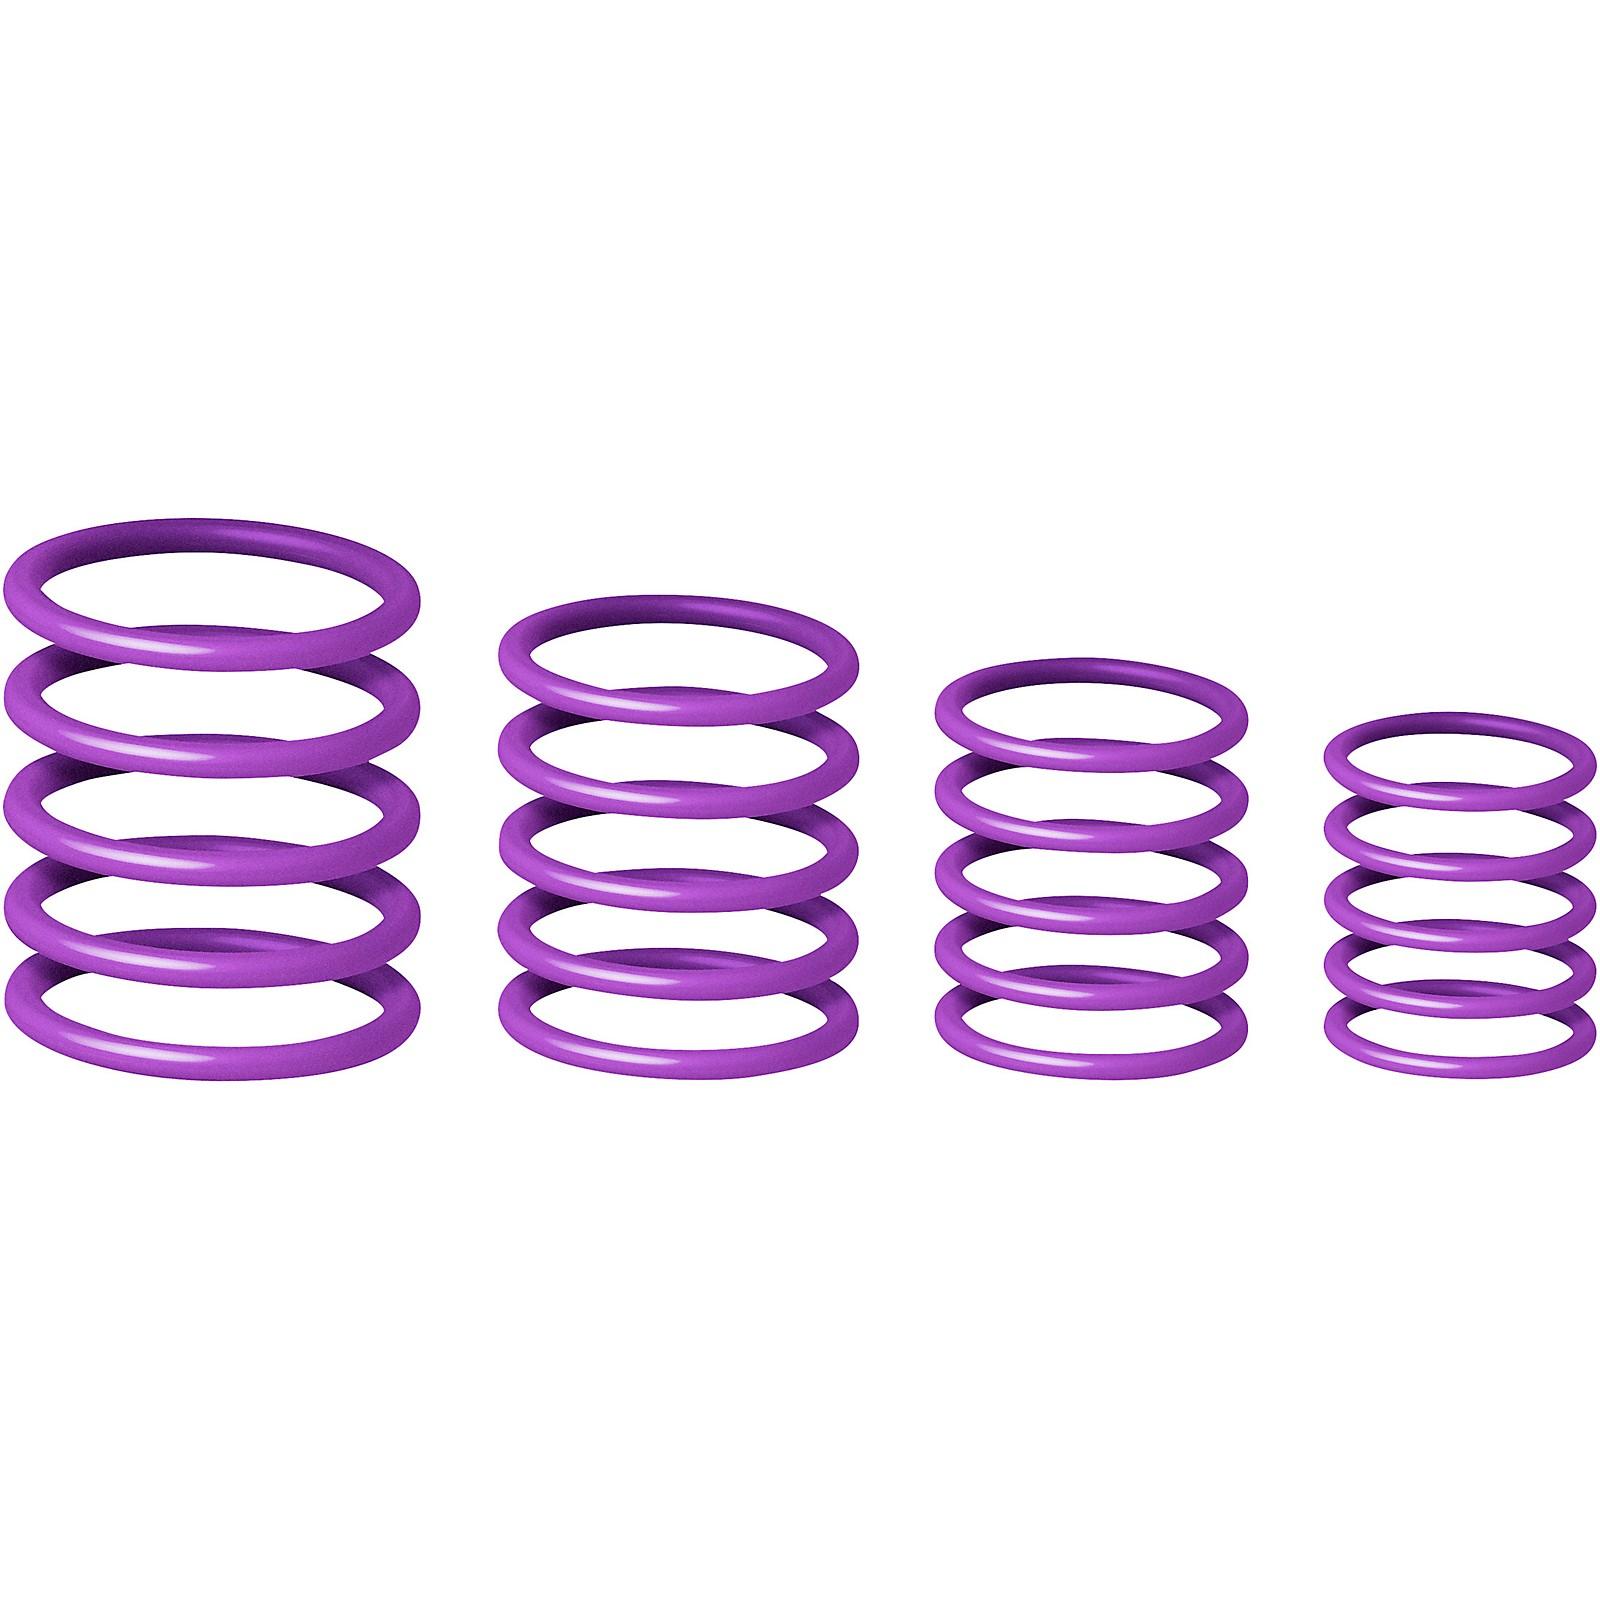 Gravity Stands Universal Gravity Ring Pack - Power Purple